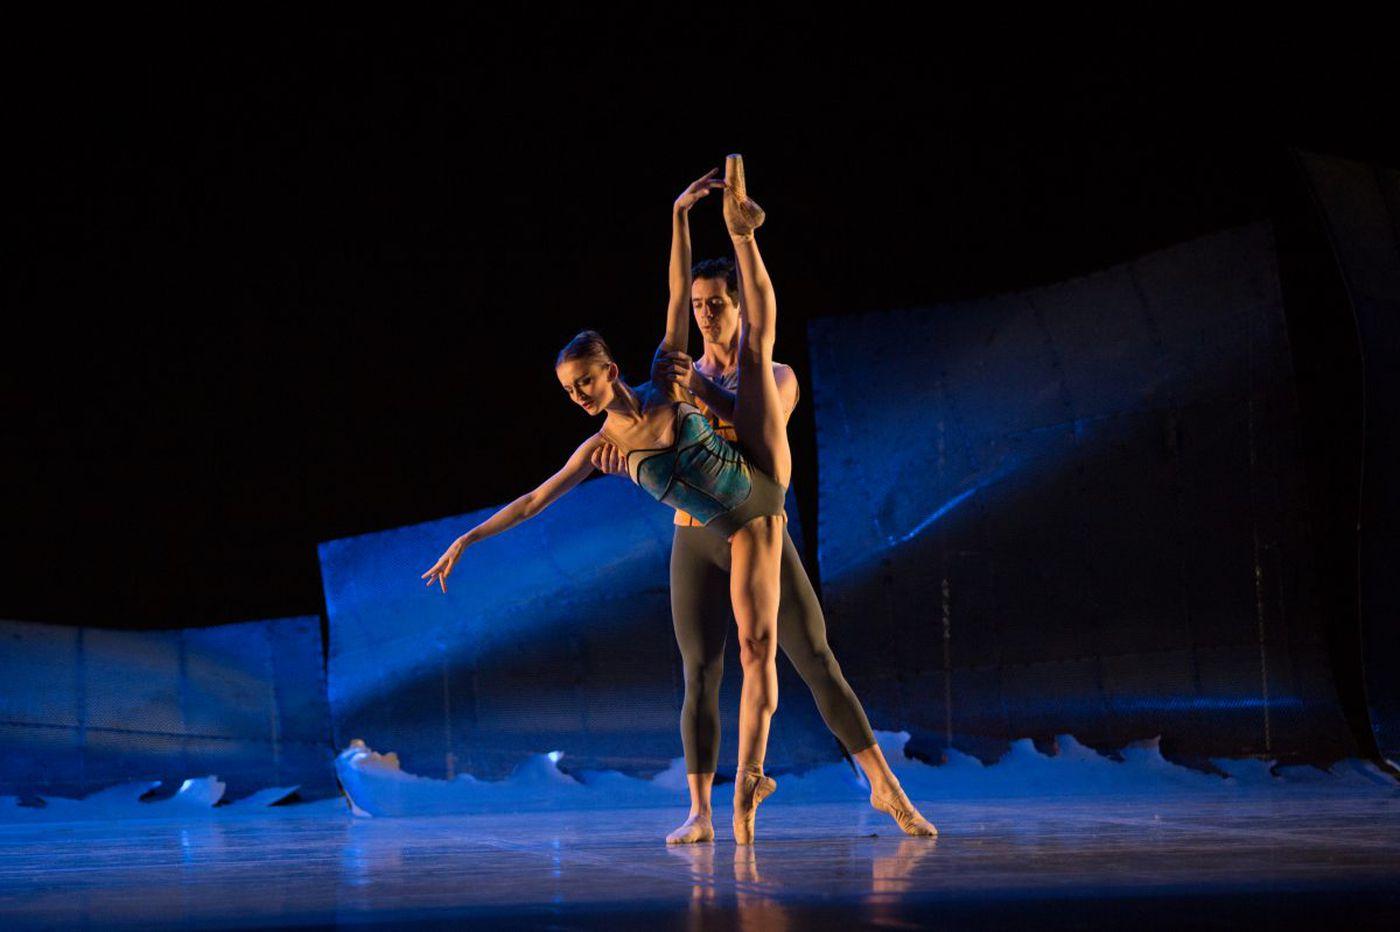 Pennsylvania Ballet announces 2018-19 season: New 'Giselle,' 'Romeo & Juliet'